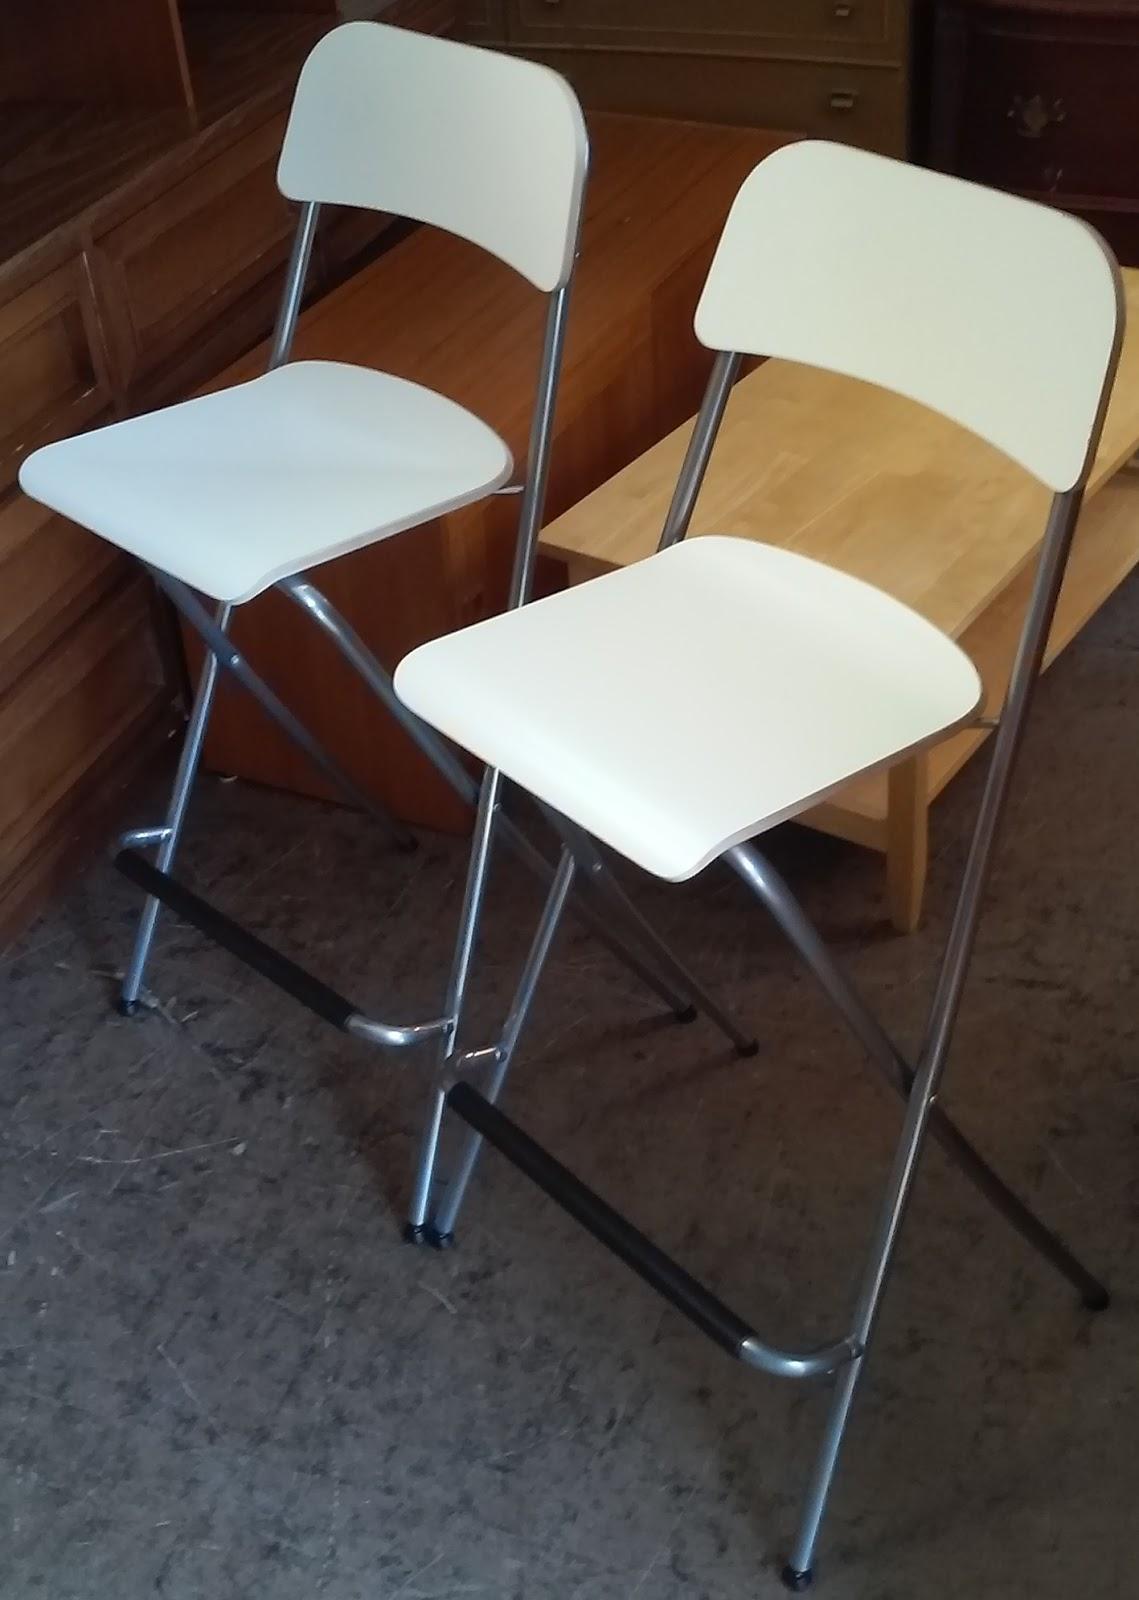 Uhuru Furniture Amp Collectibles Sold White Folding Bar